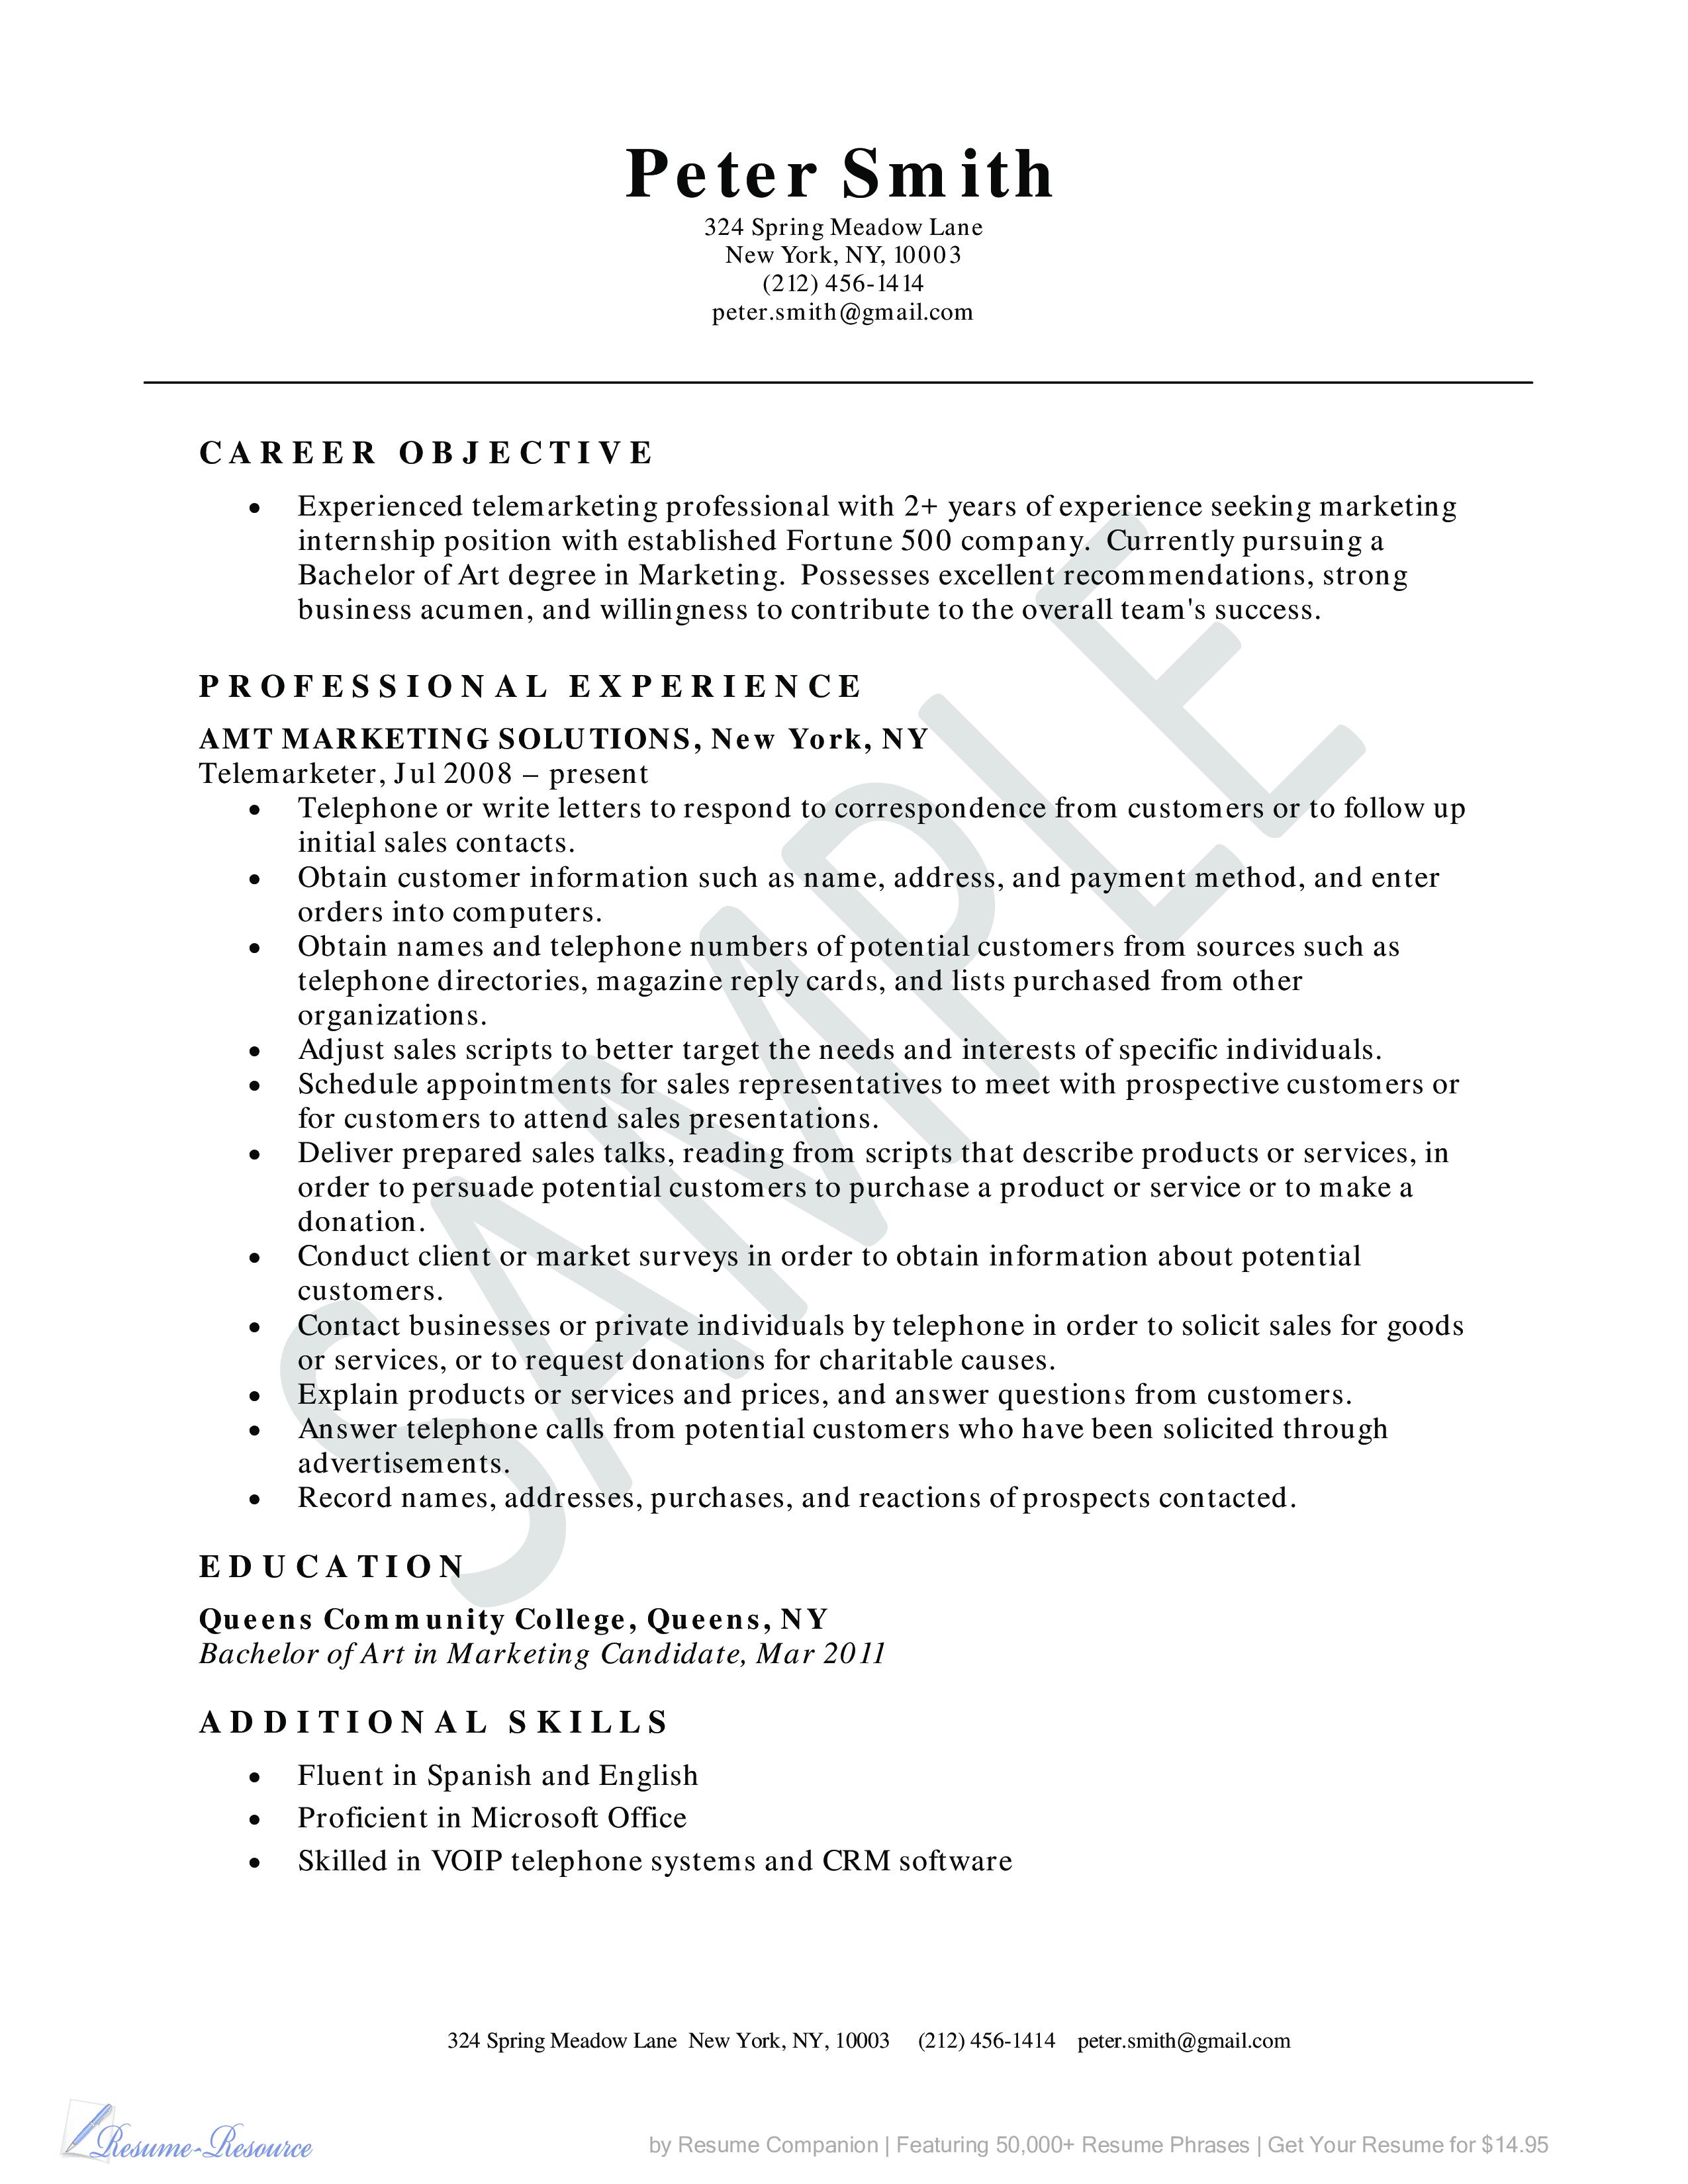 telemarketer resume example business resume example - Telemarketing Resume Samples